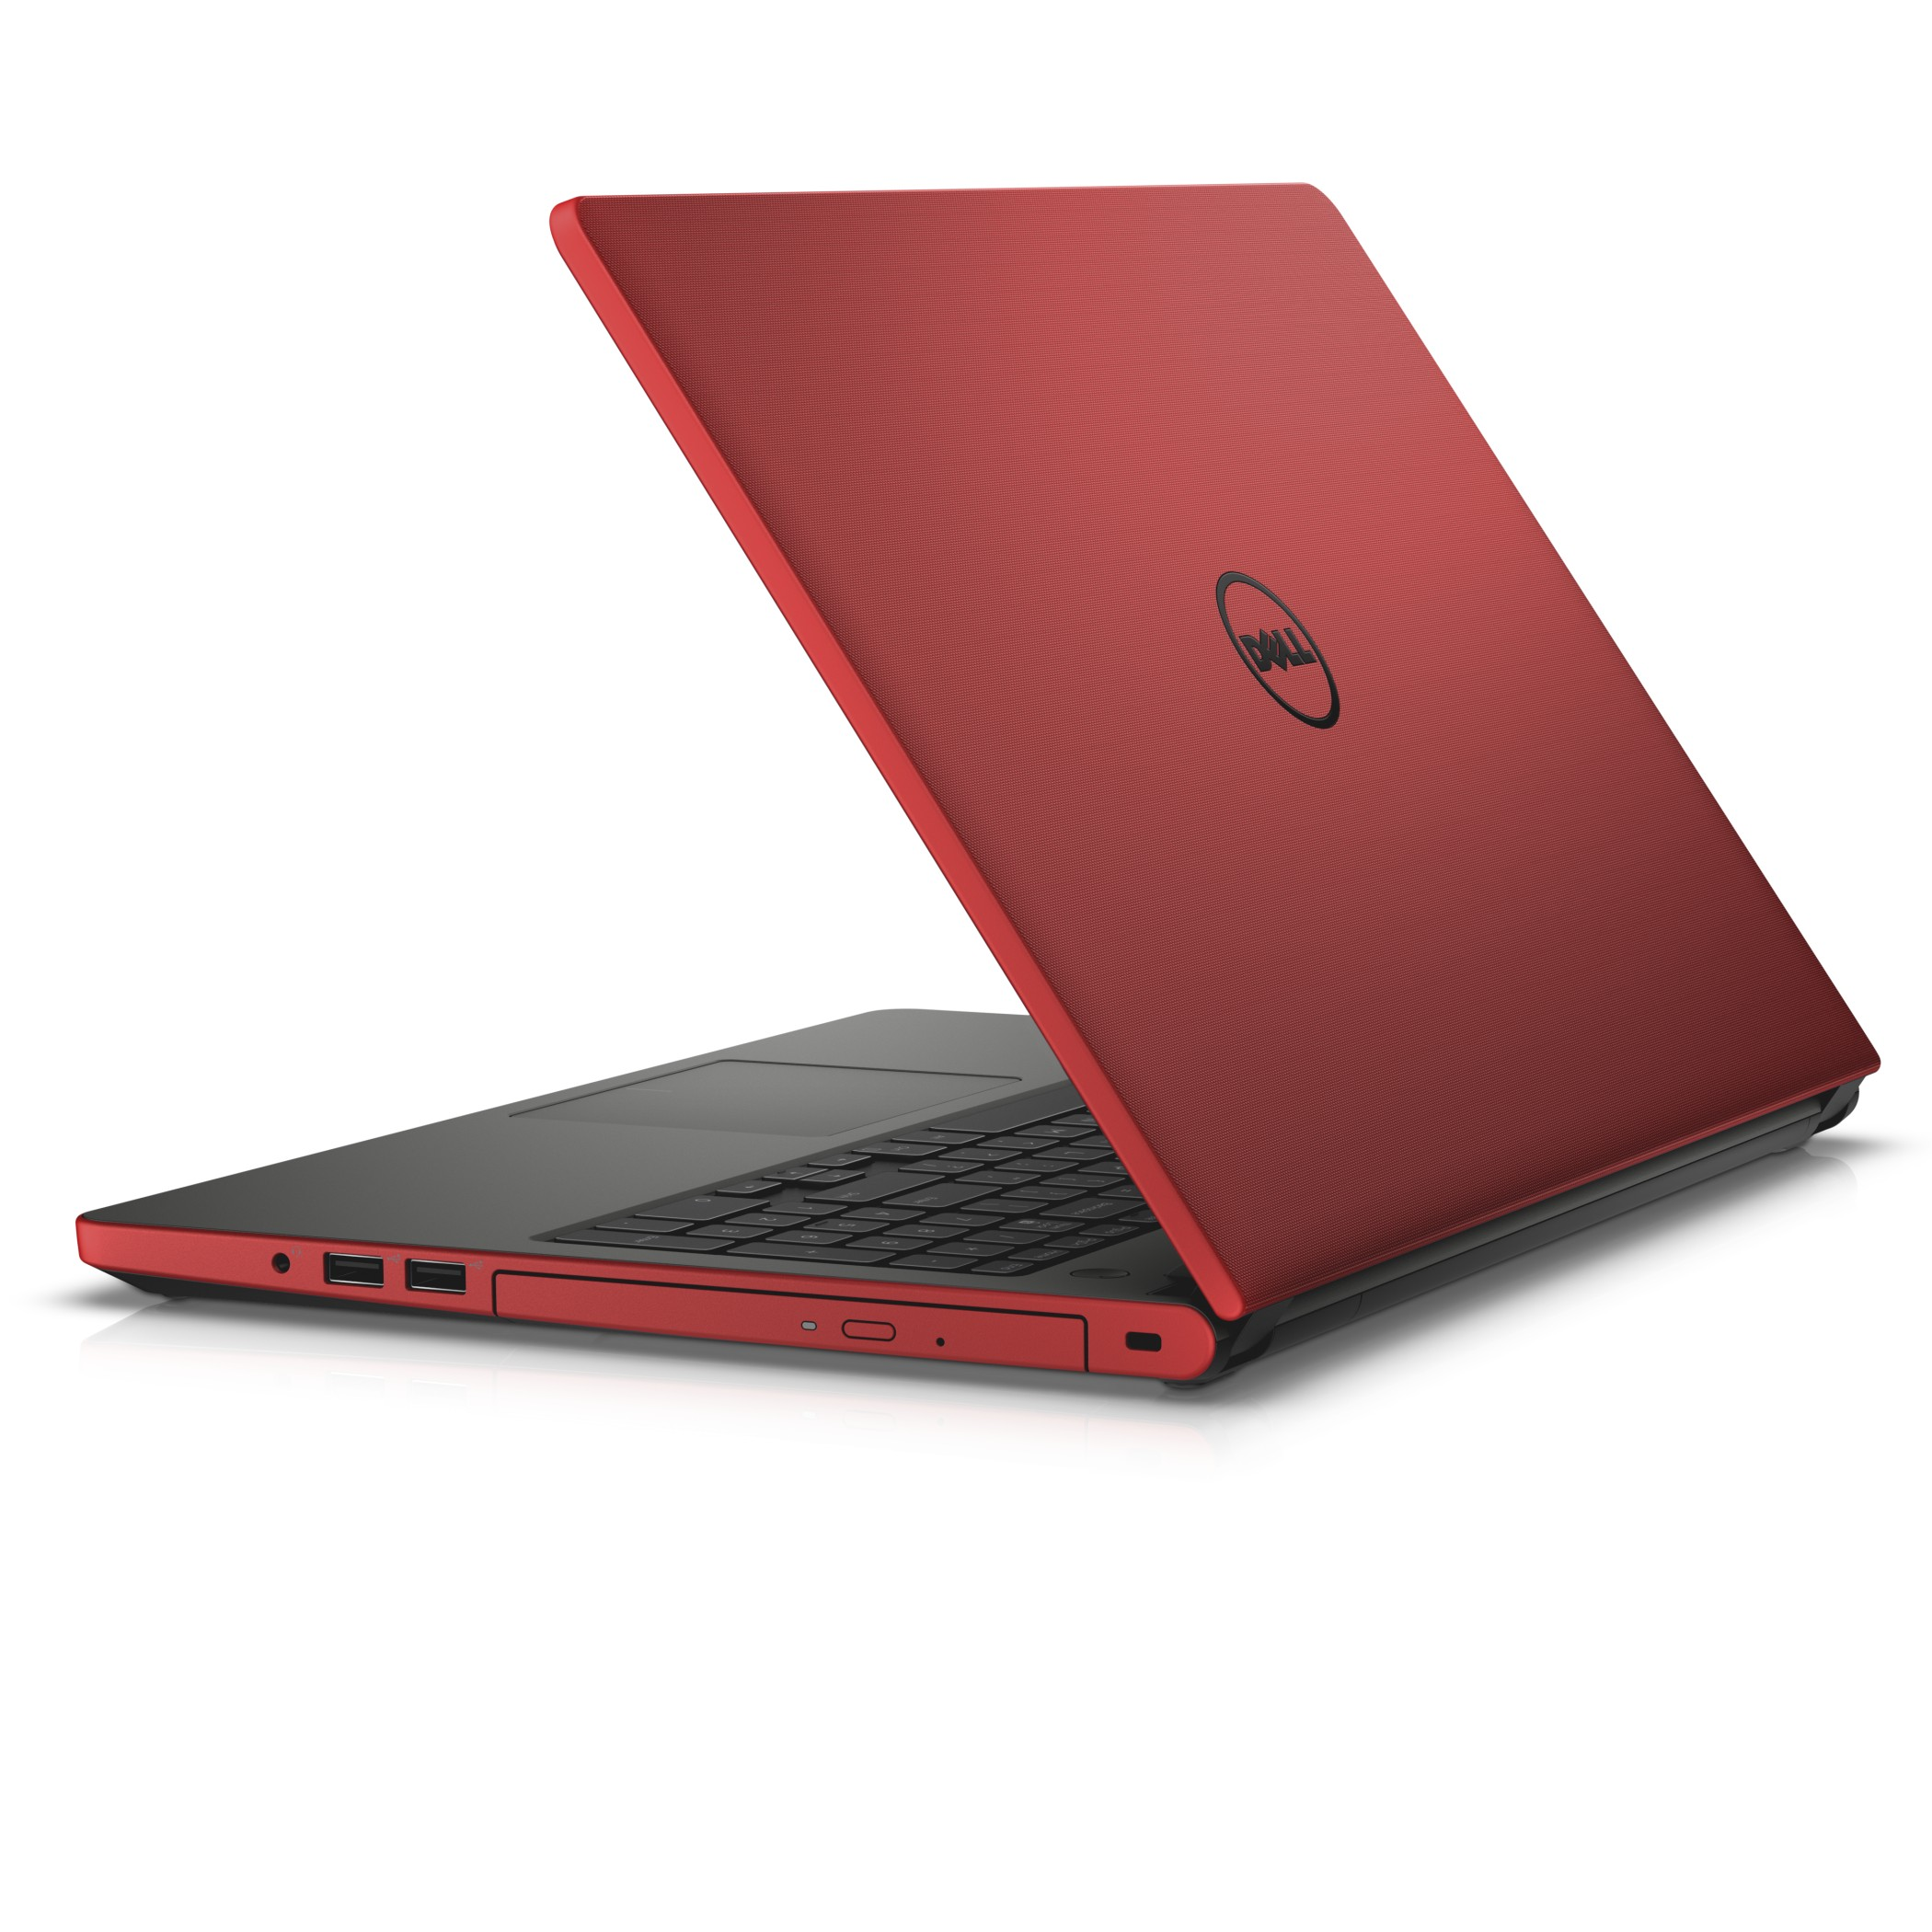 "Dell Inspiron 5559 15"" i5-6200U/4GB/500GB/M335-2G/HDMI/RJ45/WIFI/BT/MCR/W10UPG/2NBD červený"